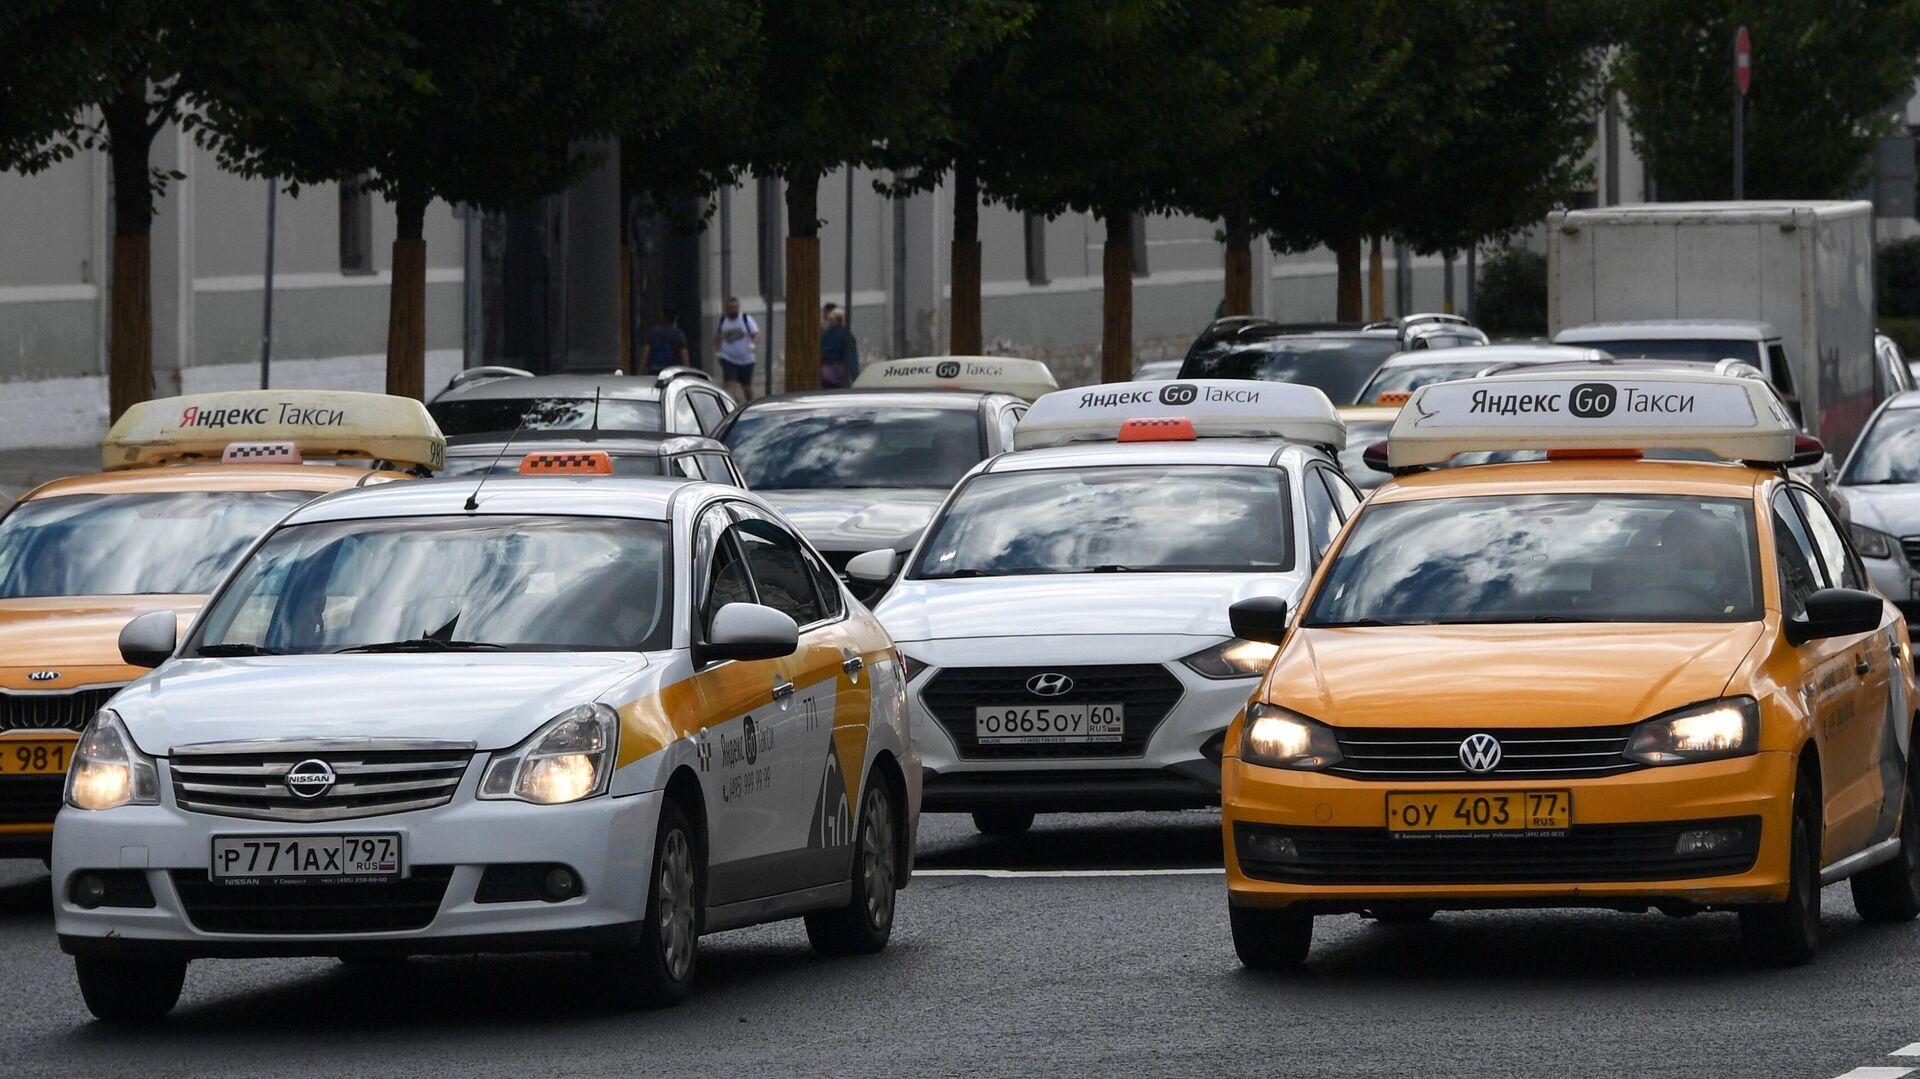 В Москве отложили мониторинг за таксистами - Sputnik Таджикистан, 1920, 09.08.2021